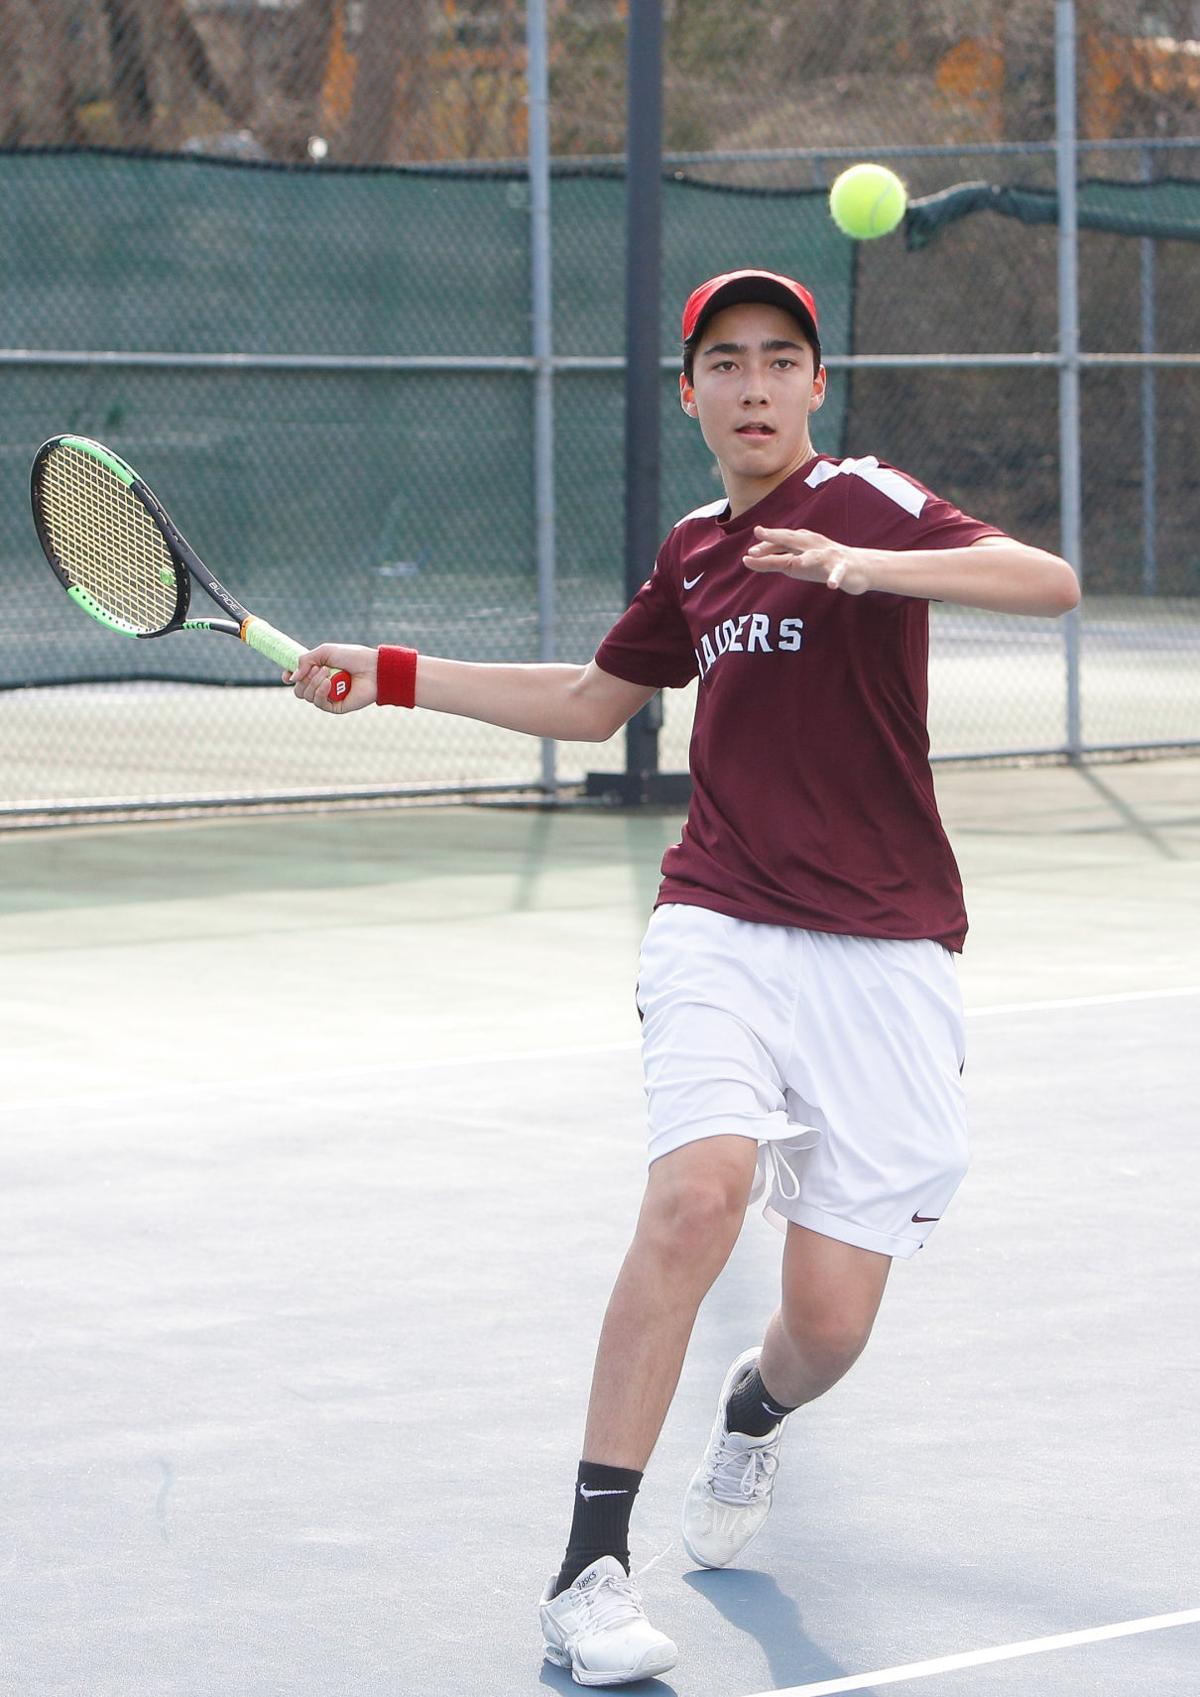 Sc boys tennis 040819 Jason Shuler 1.jpg